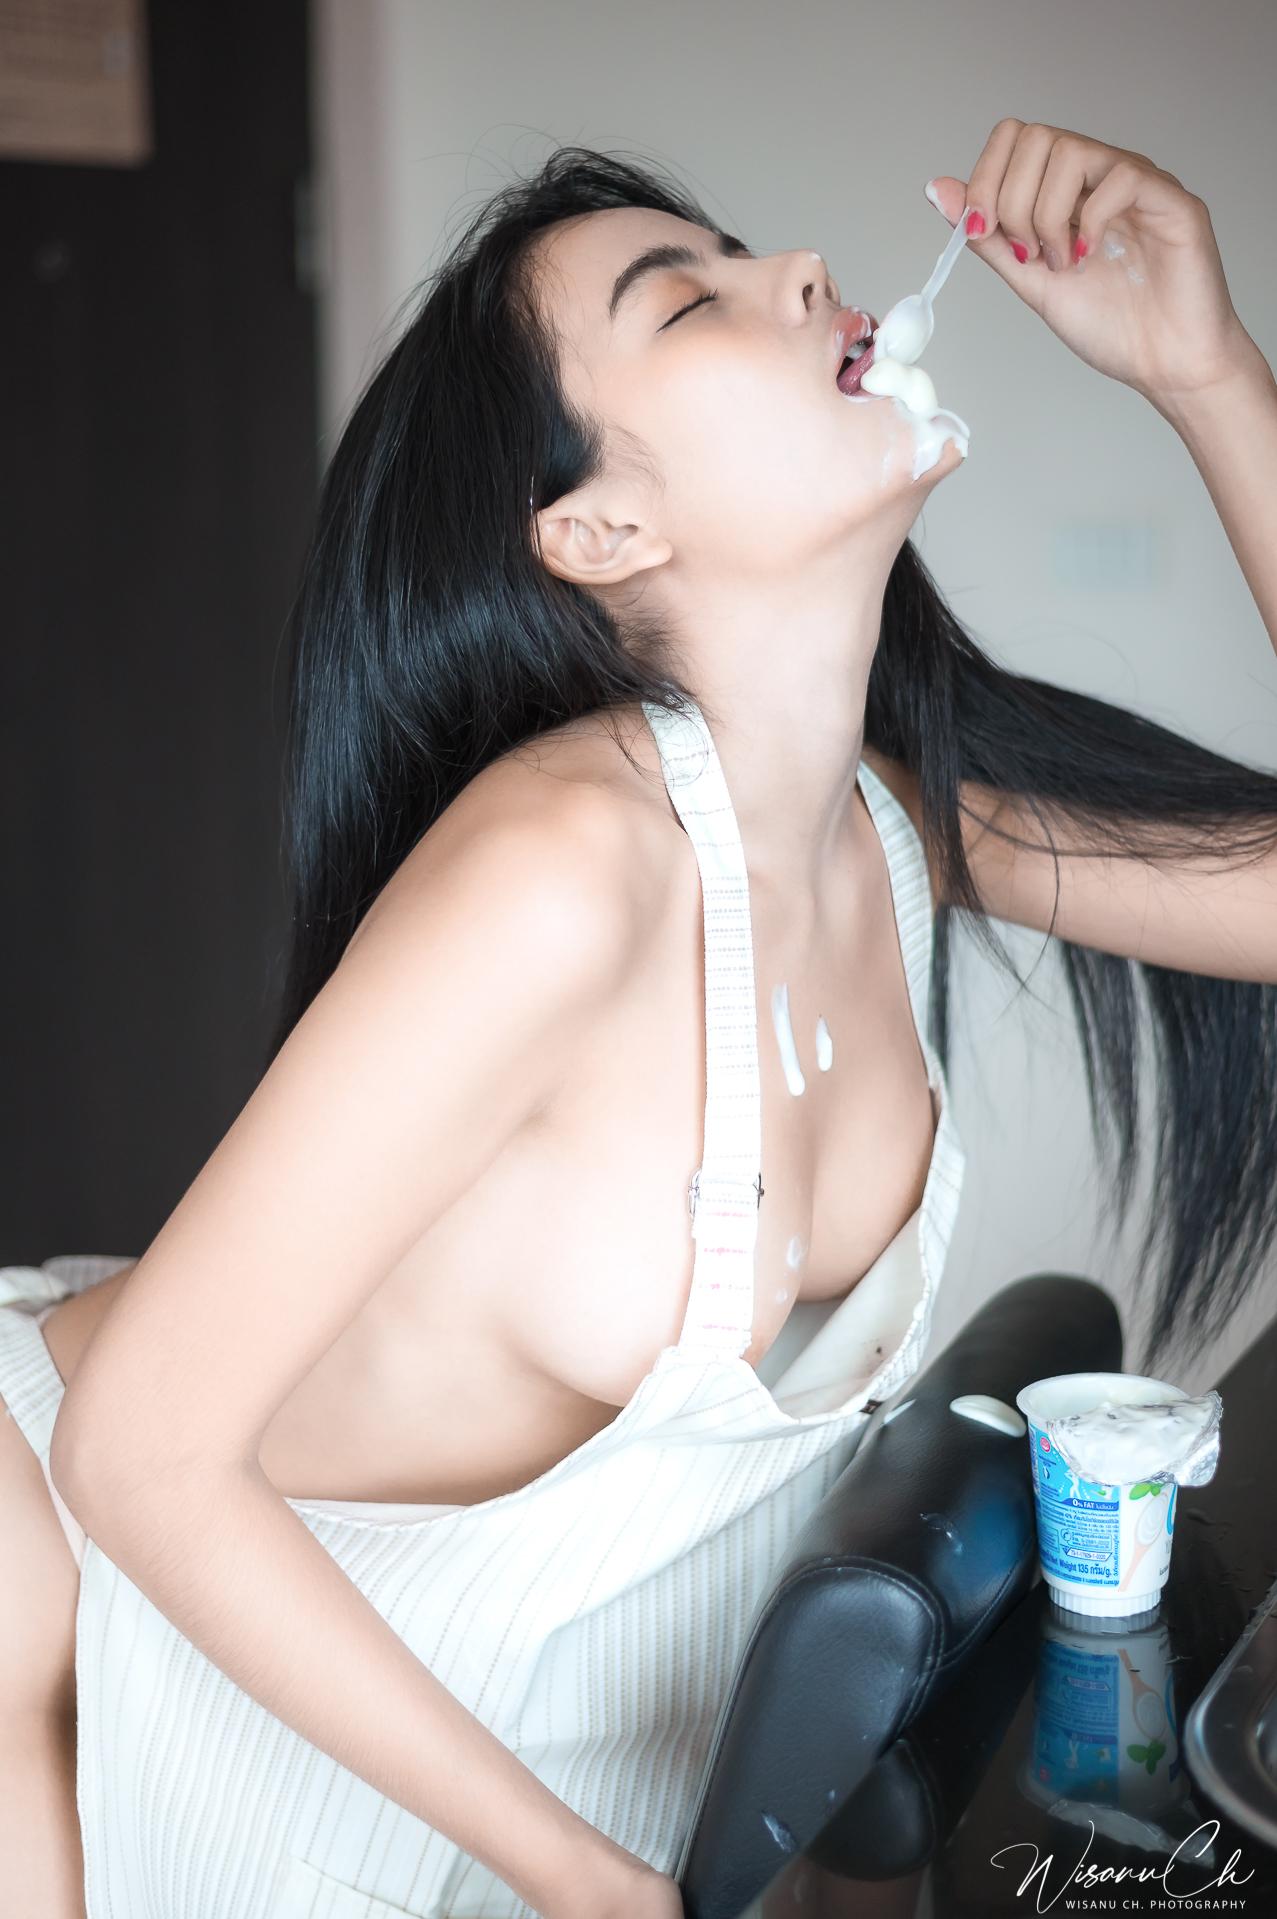 A Hungry Maid - Kanokwan Kamenid